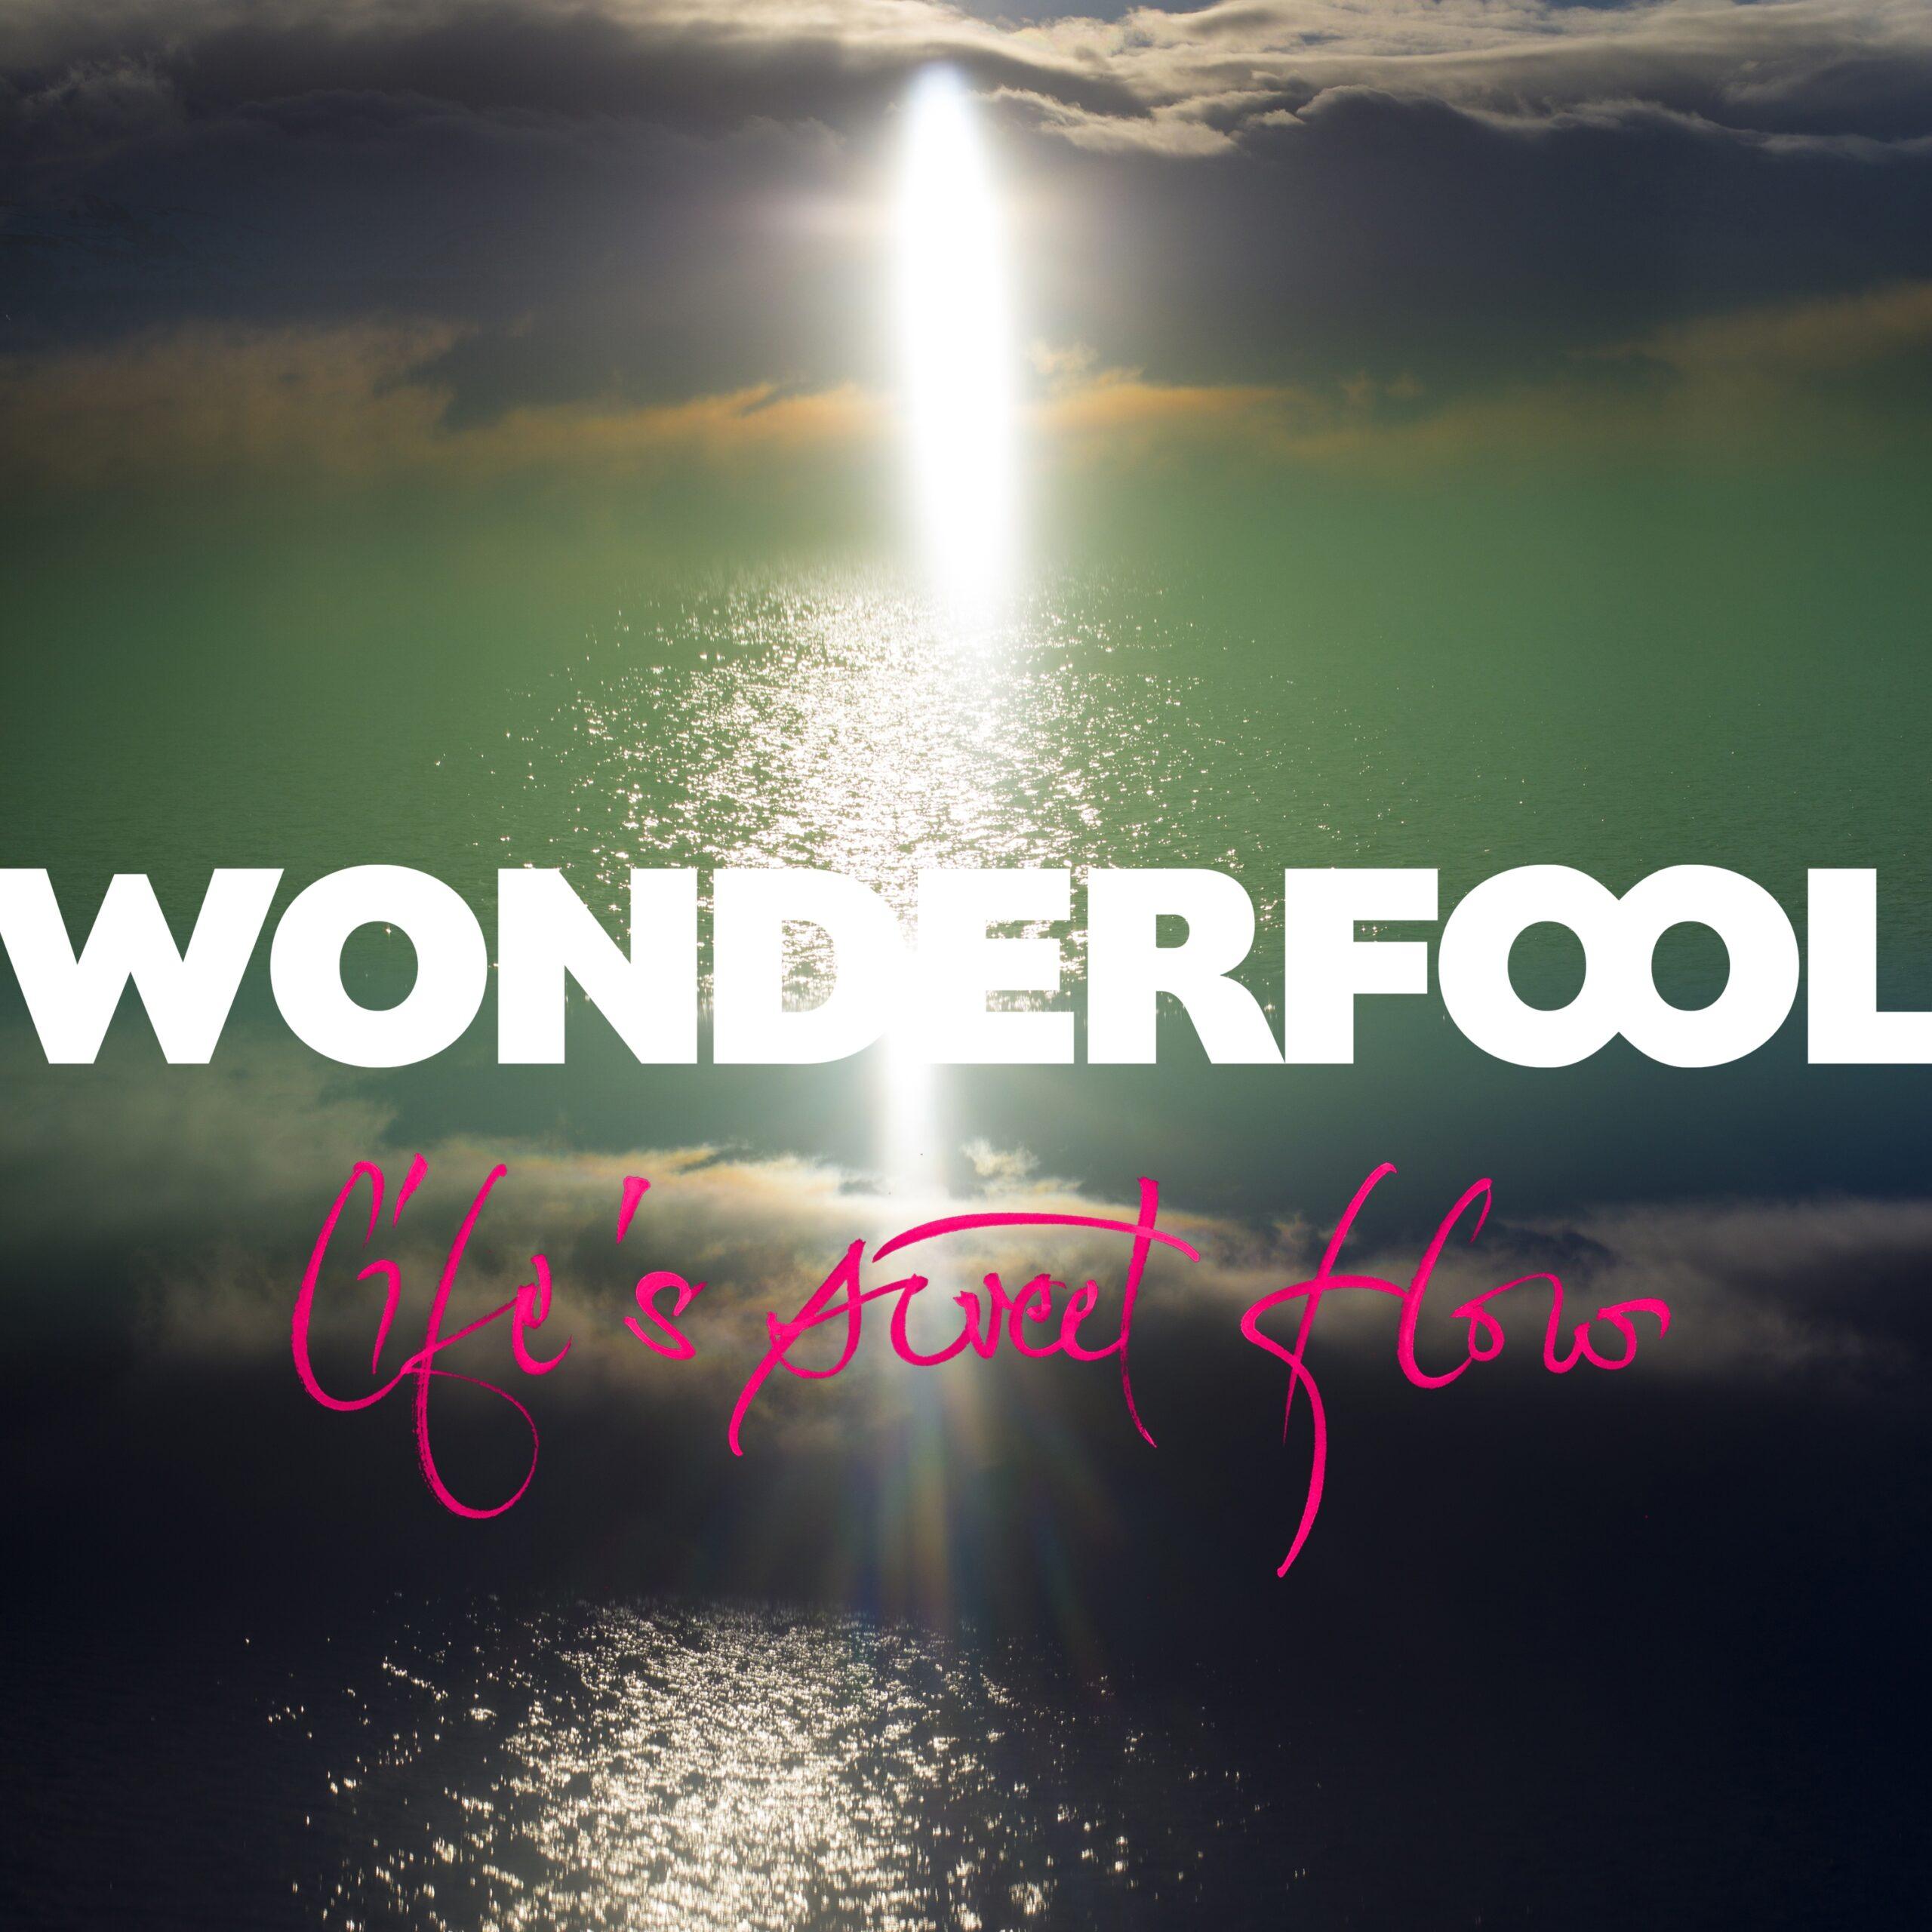 wonderfool album life's sweet flow